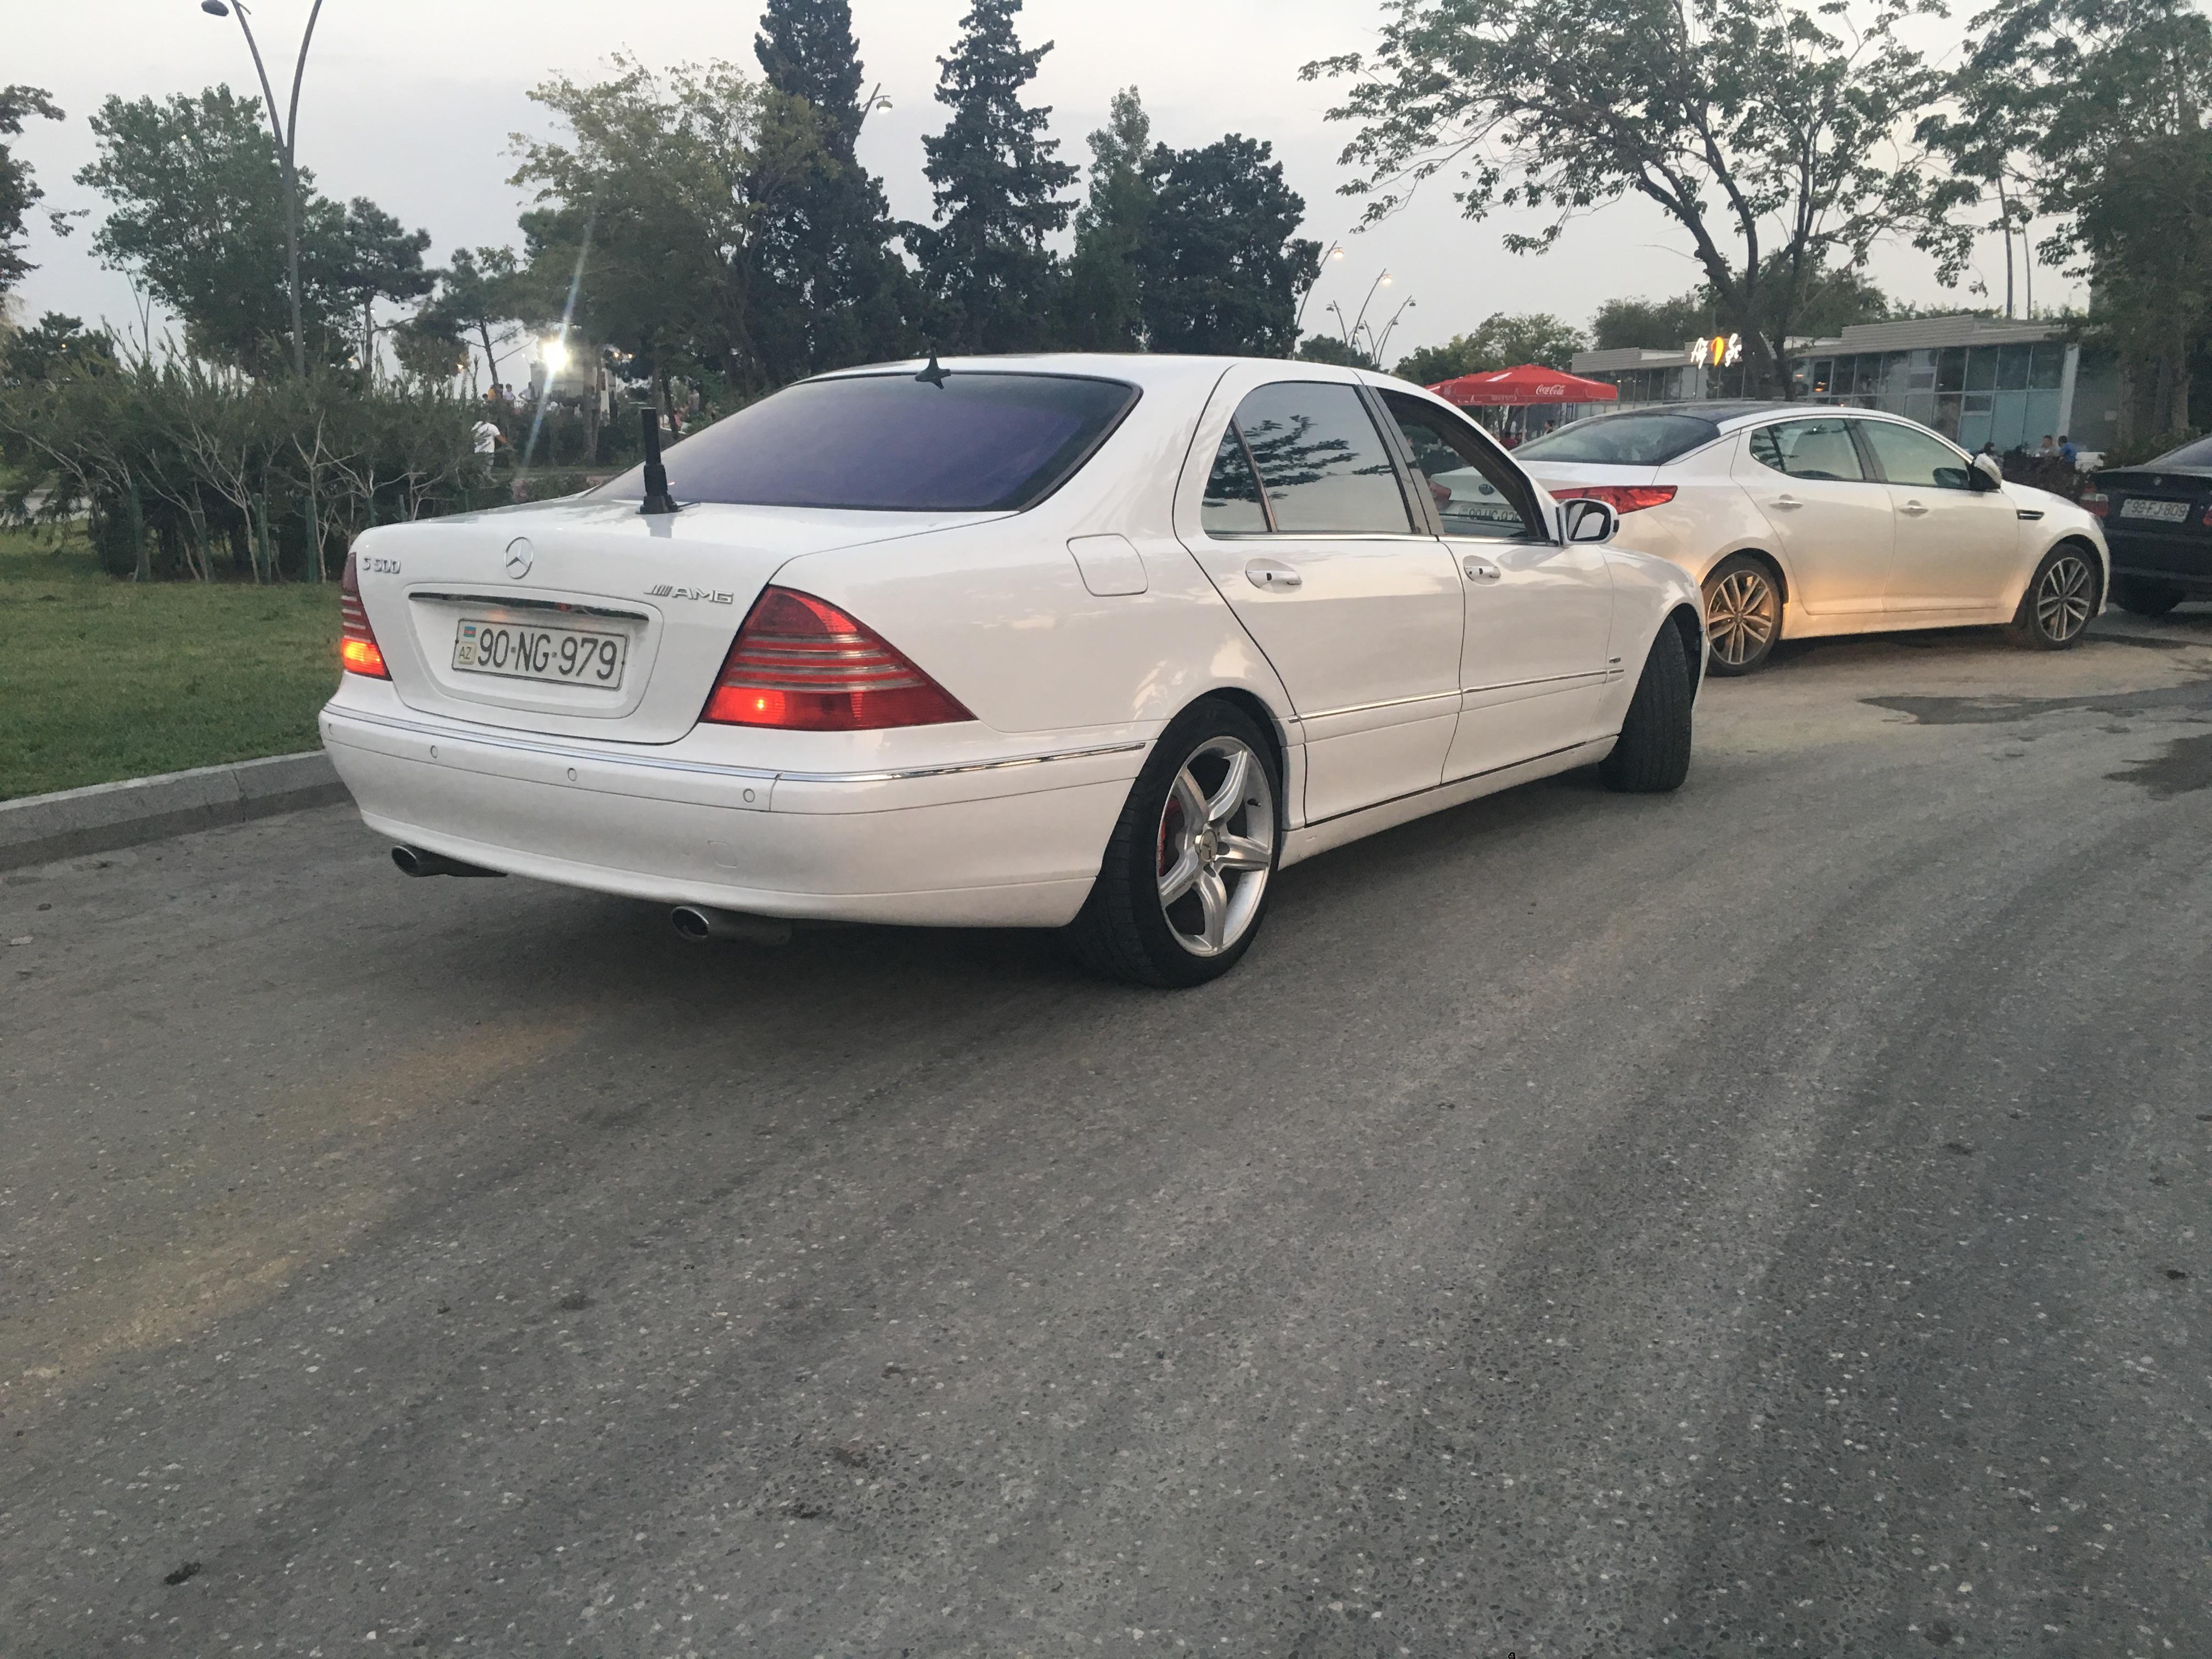 Mercedes-Benz S 320 3.2(lt) 2000 İkinci əl  $7800